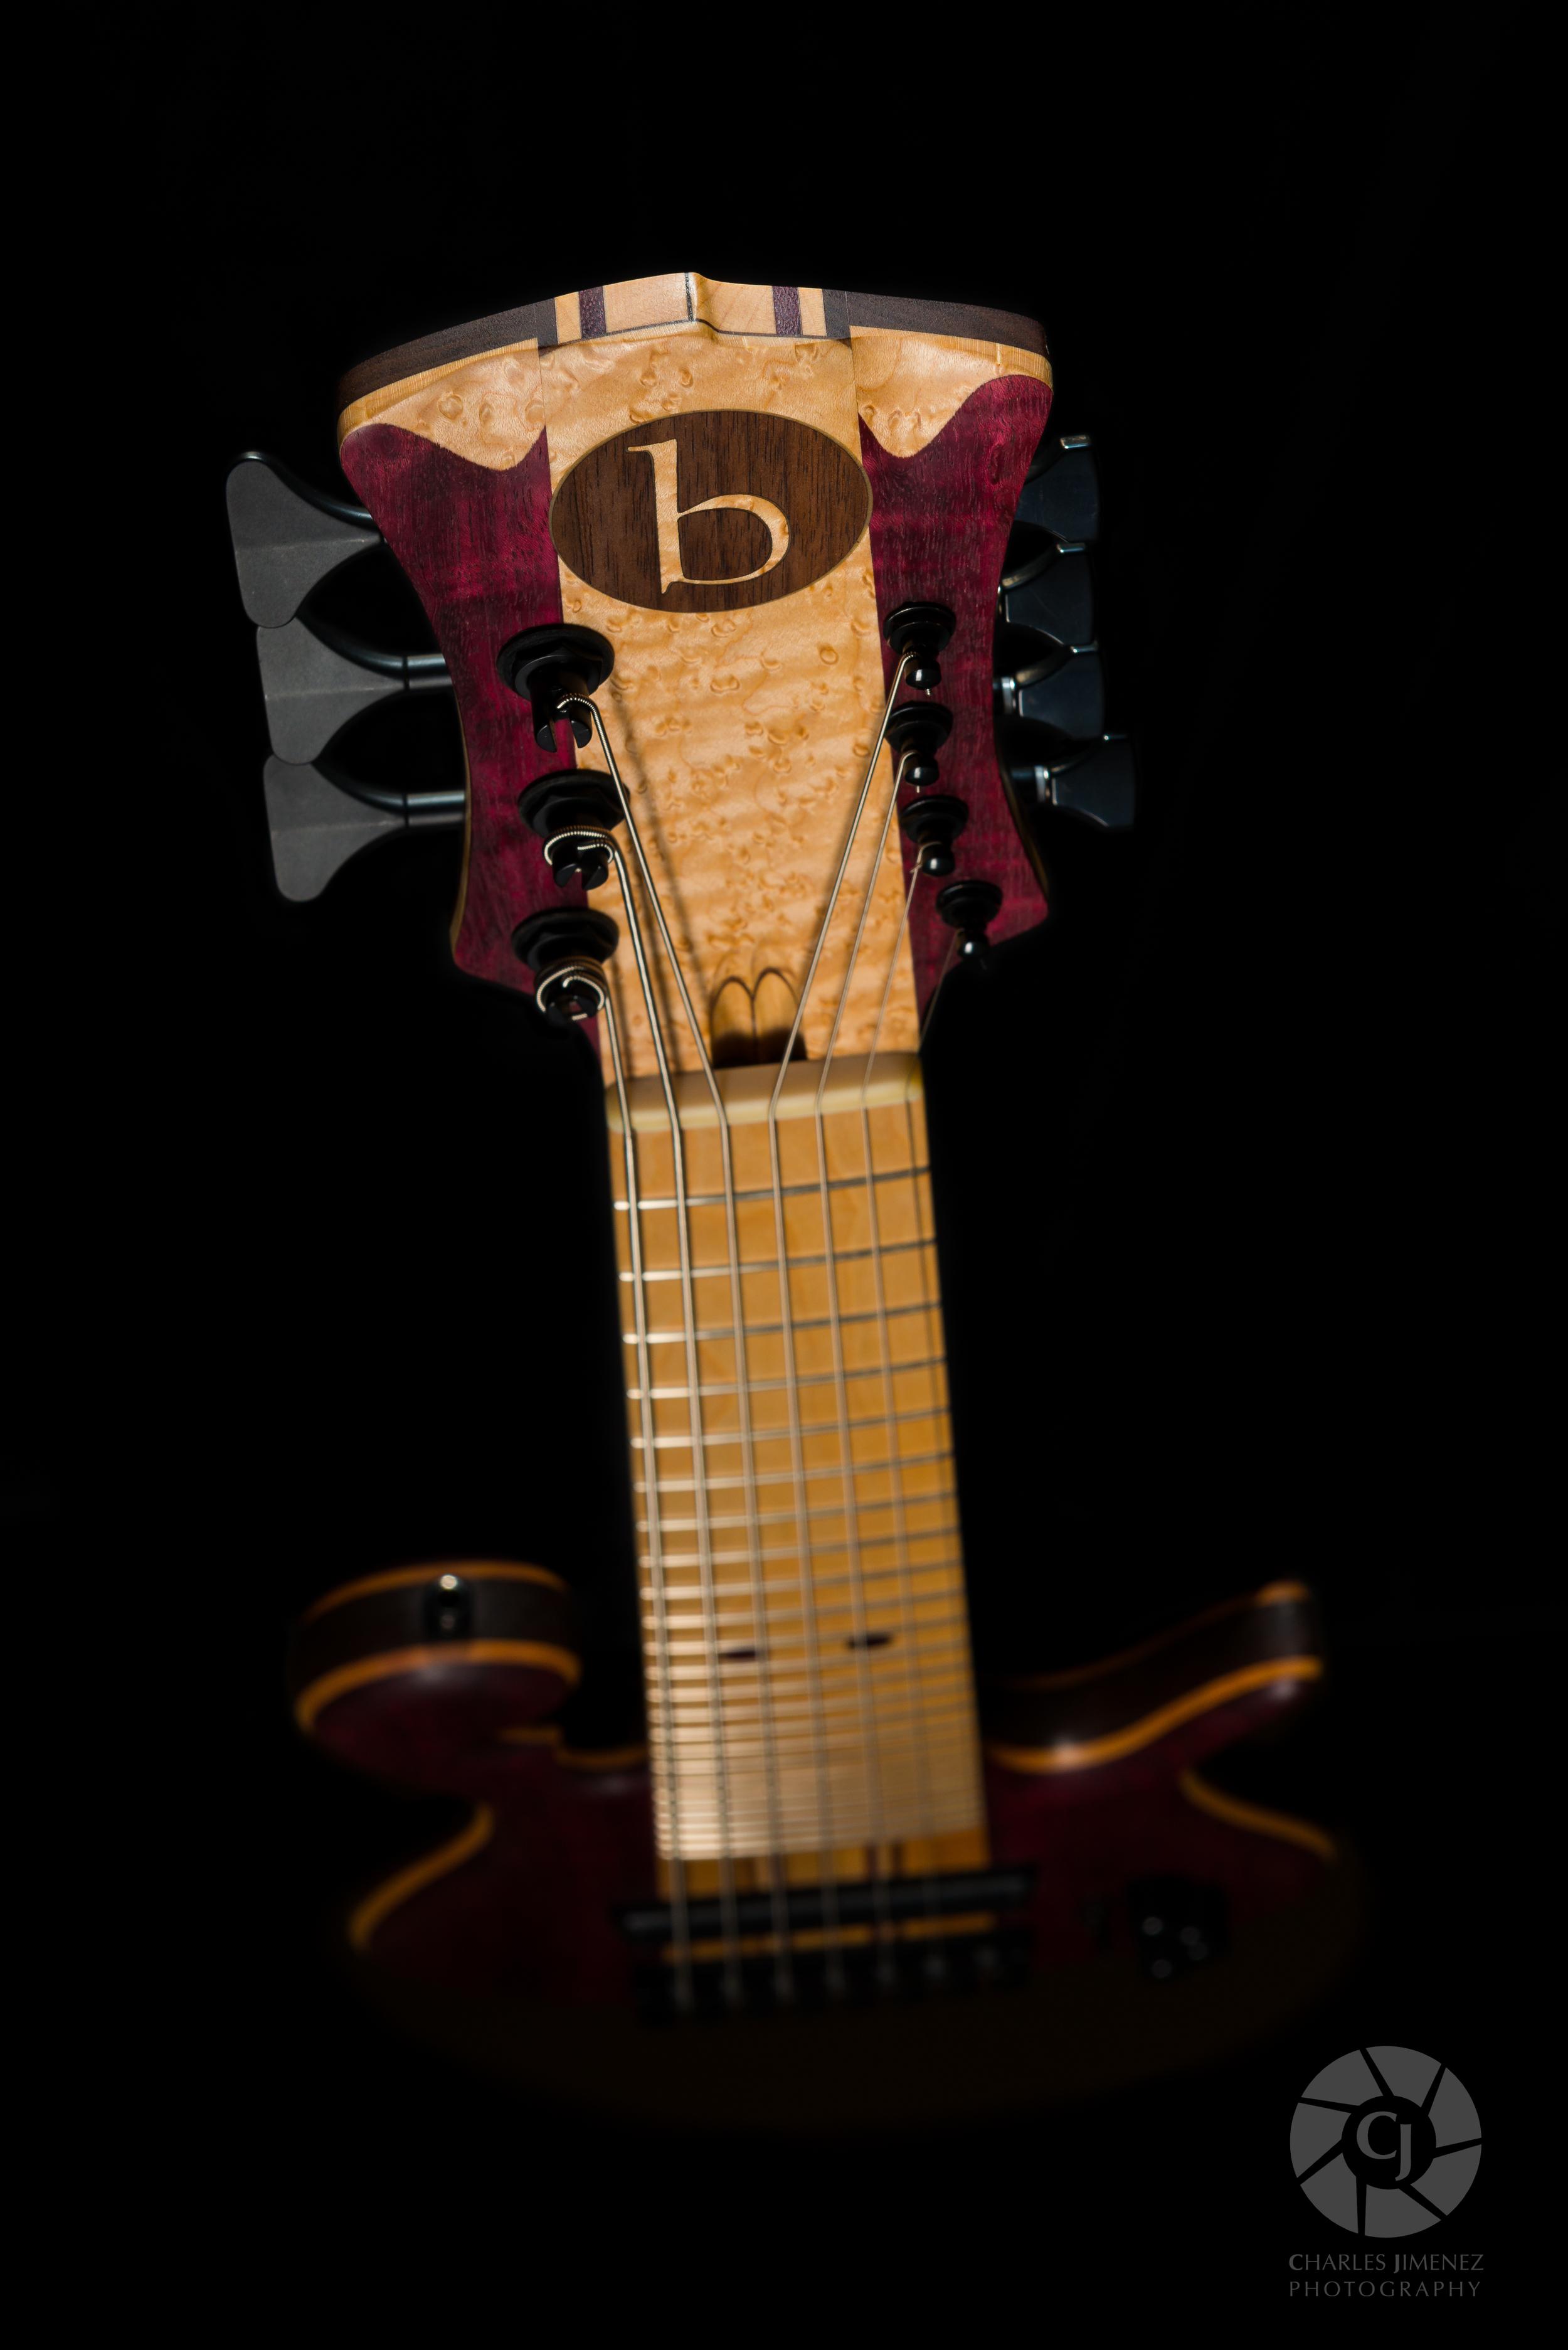 BMT Guitars_Grimace_January 04 2014_06.jpg